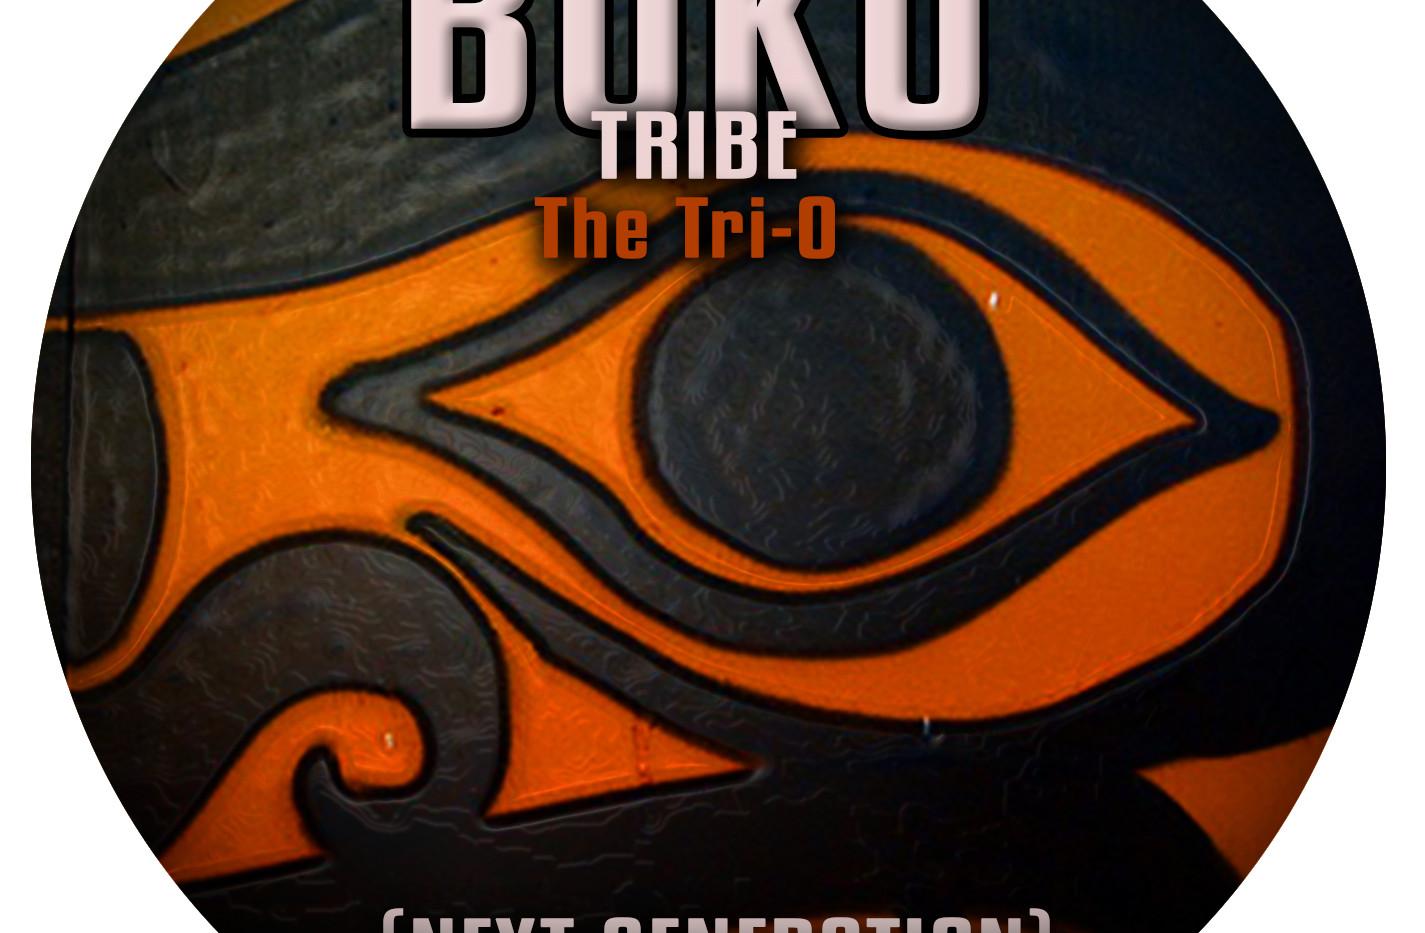 Buku Tribe The Trio CD Label.jpg